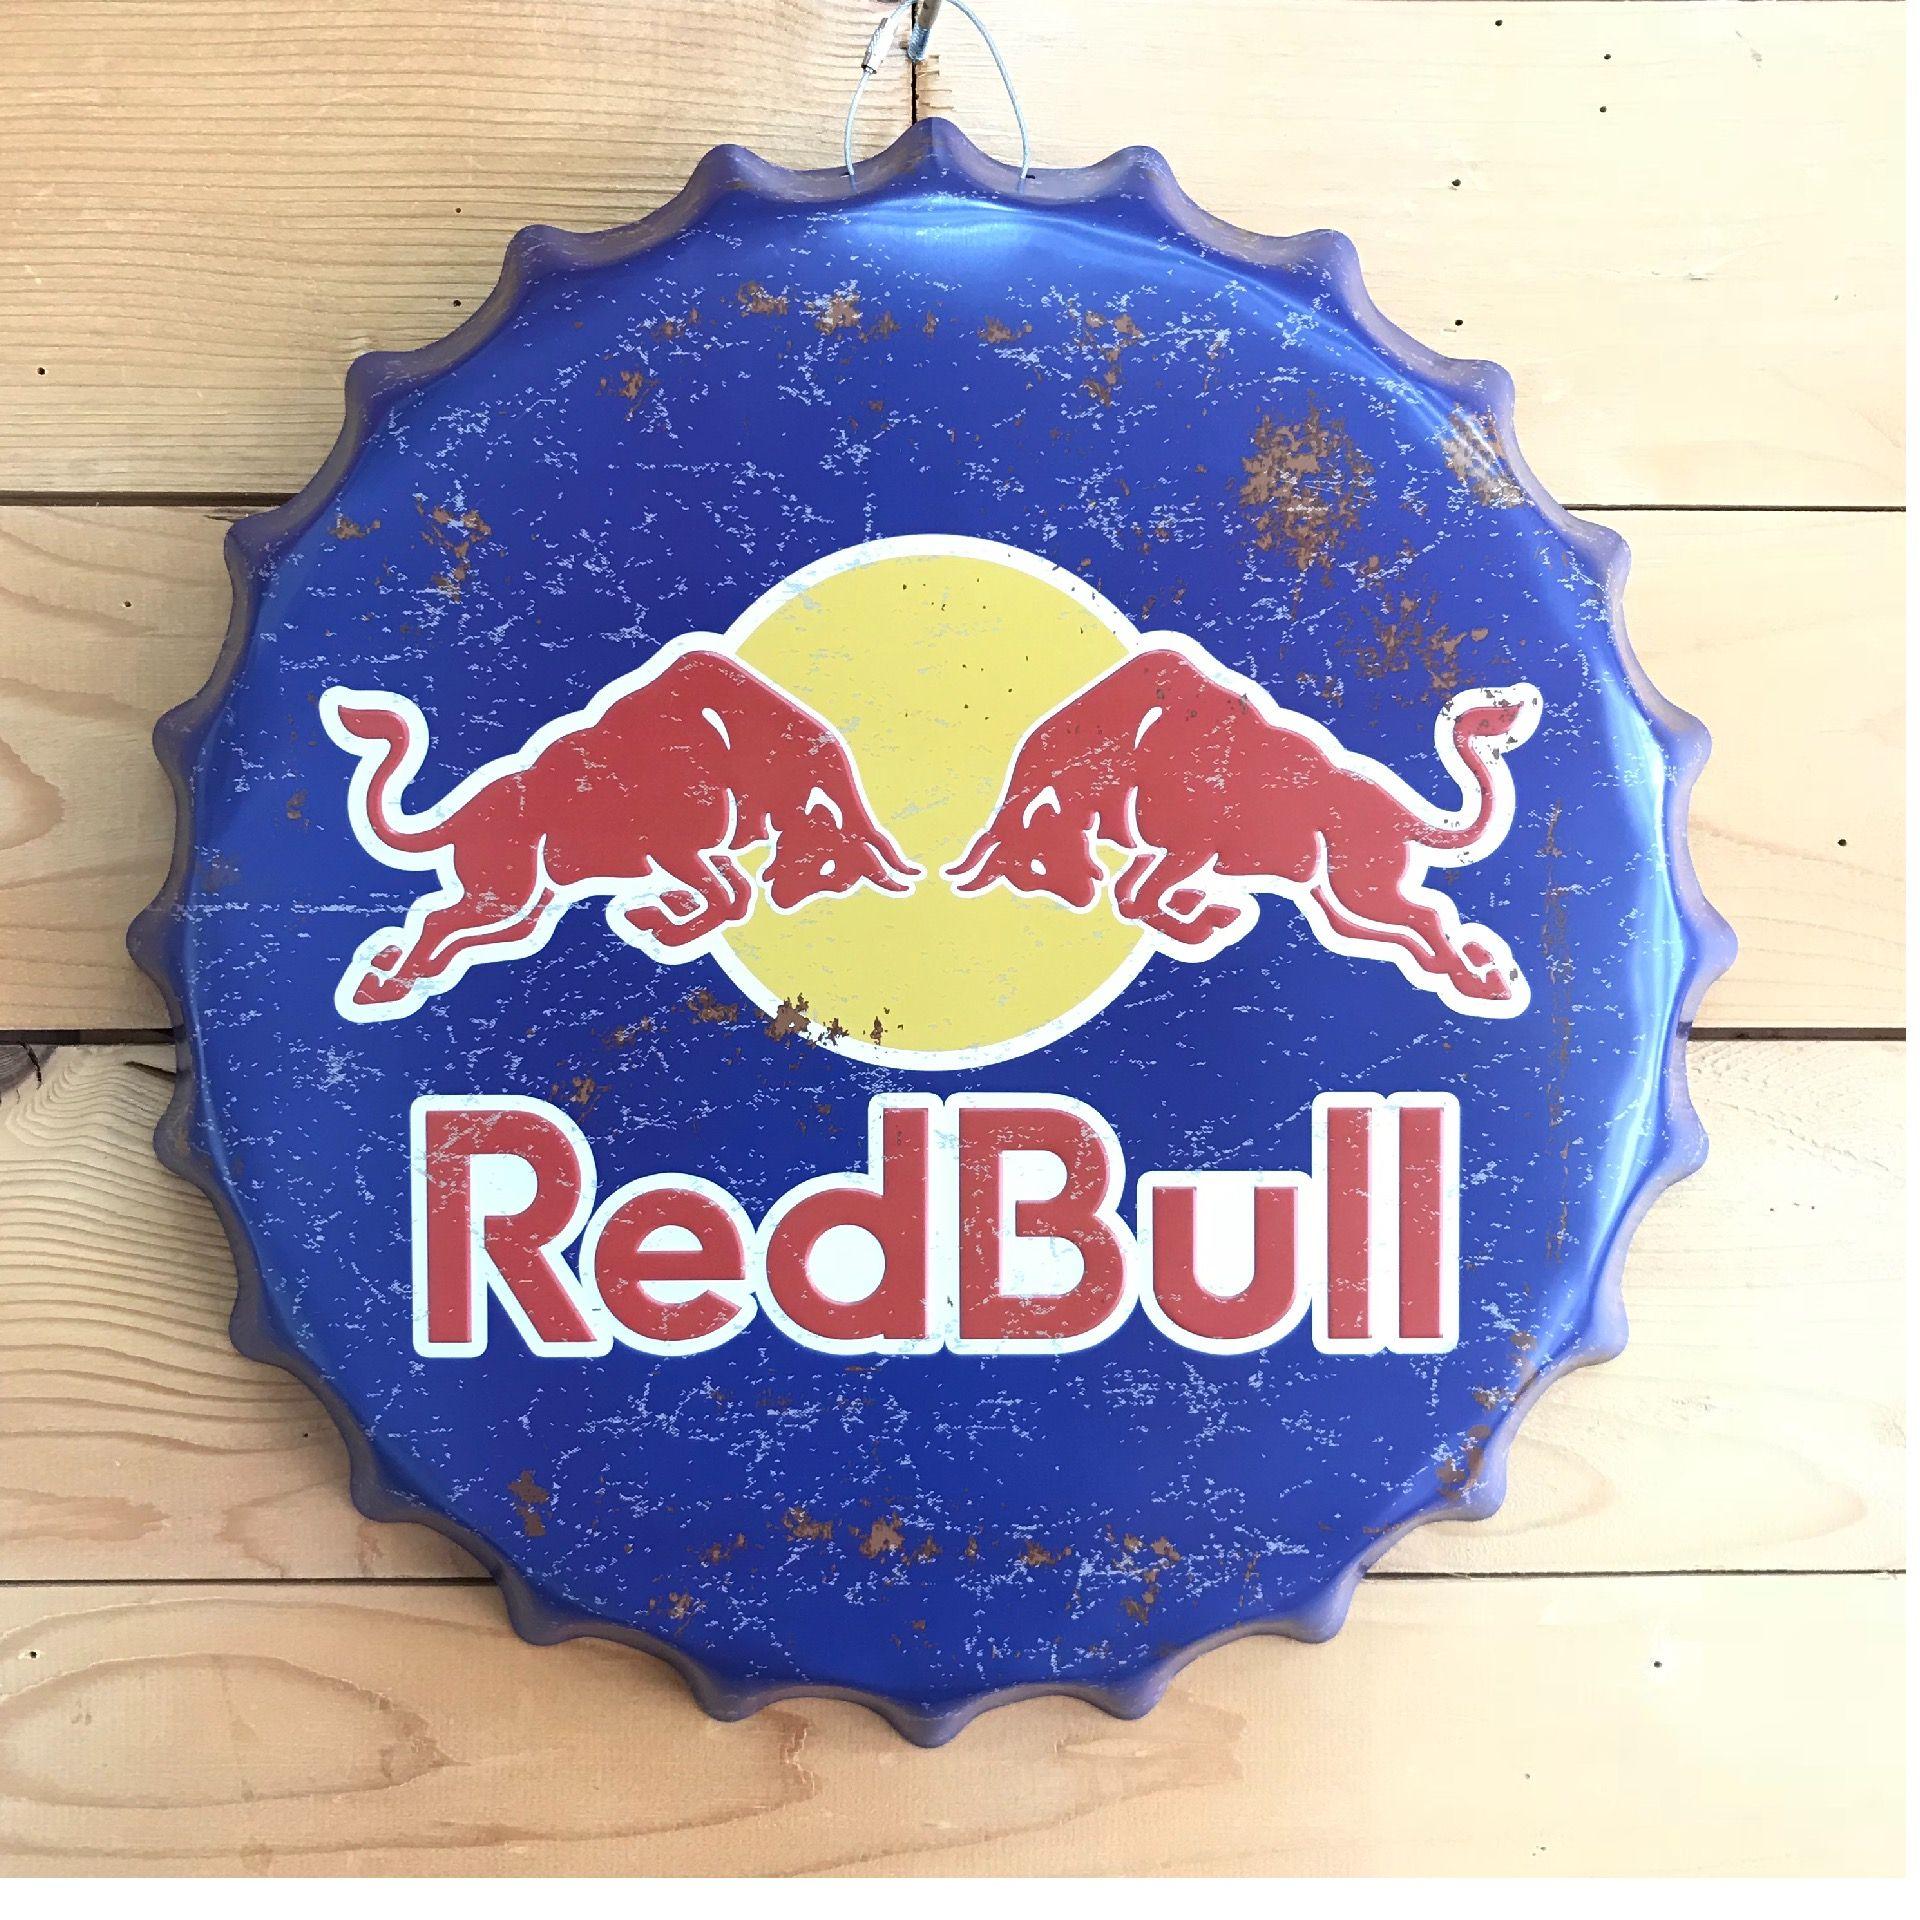 Chapa Red Bull.